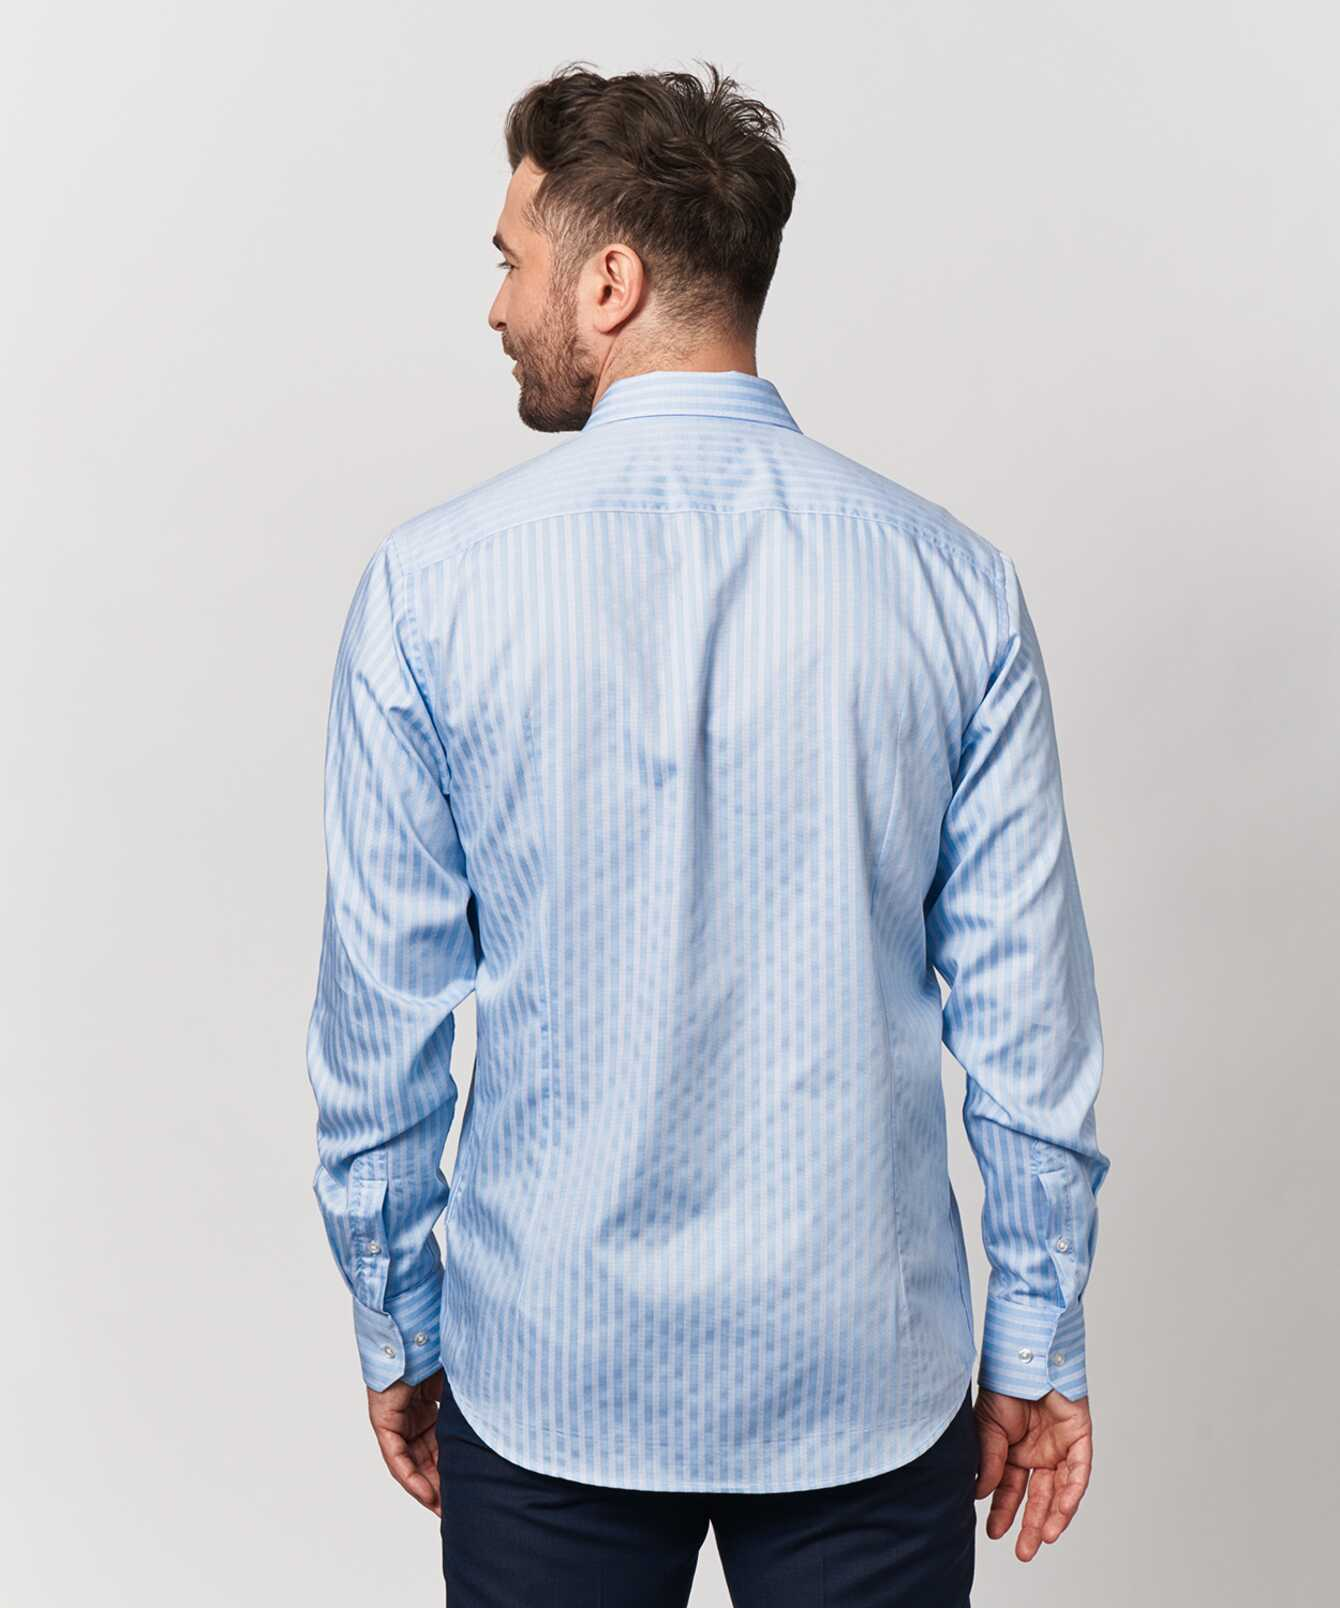 Shirt Bandon Stripe Blå The Shirt Factory